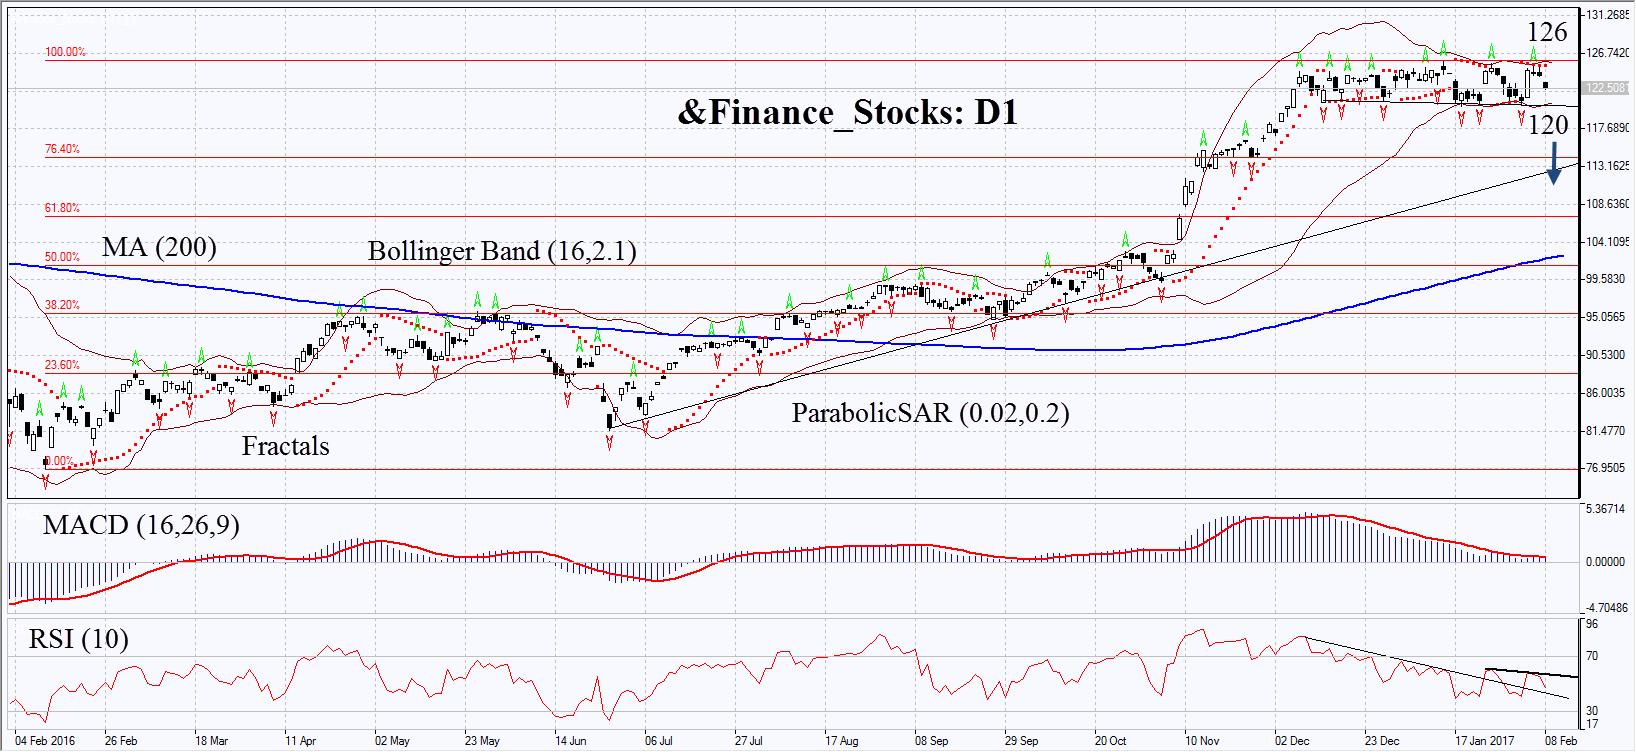 &Finance_Stocks